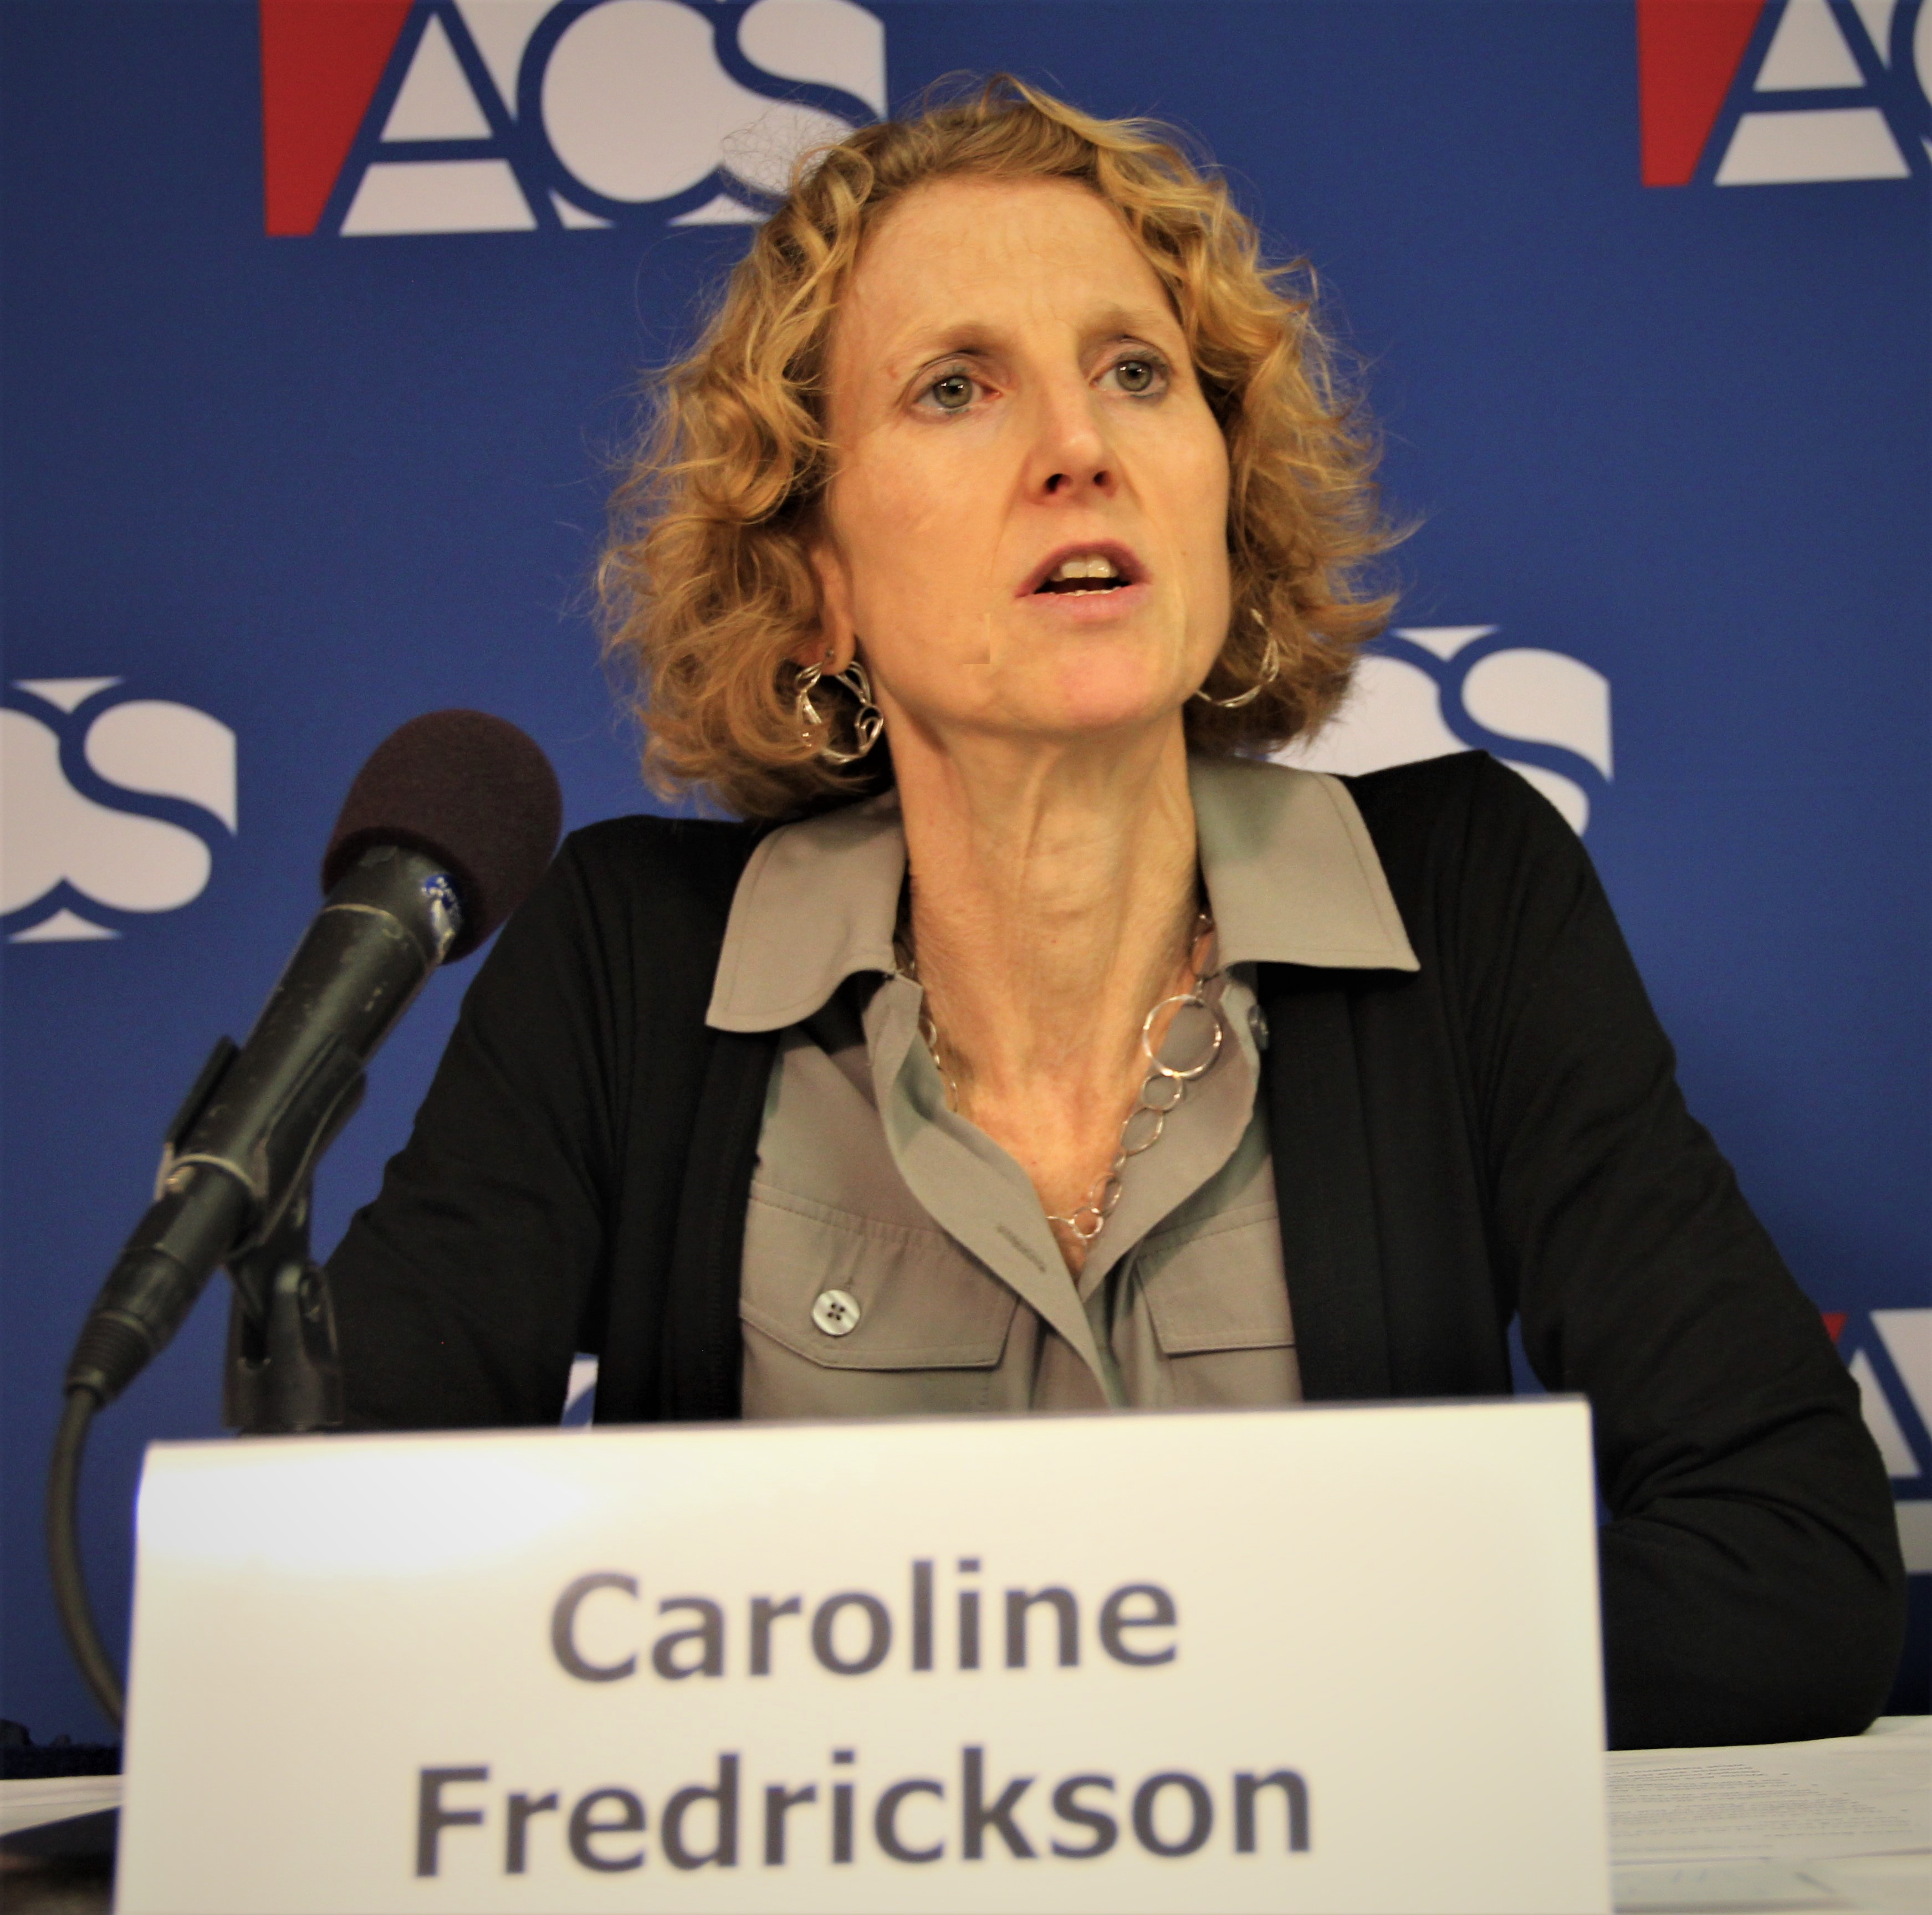 Caroline Fredrickson speaks at the 2018 ACS Supreme Court Preview, September 6 2018